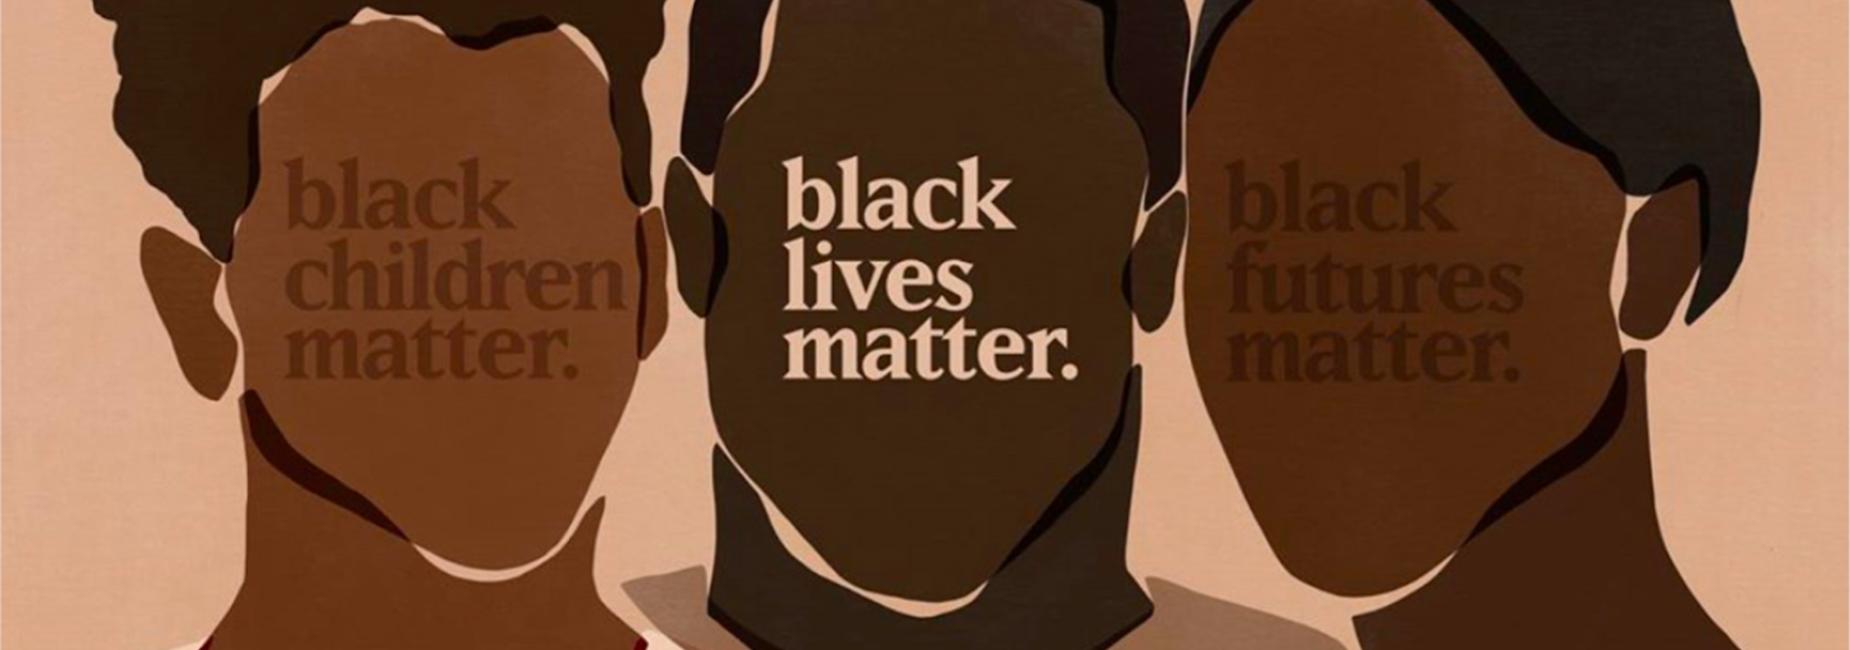 BLACK CHILDREN MATTER, BLACK LIVES MATTER, BLACK FUTURES MATTER